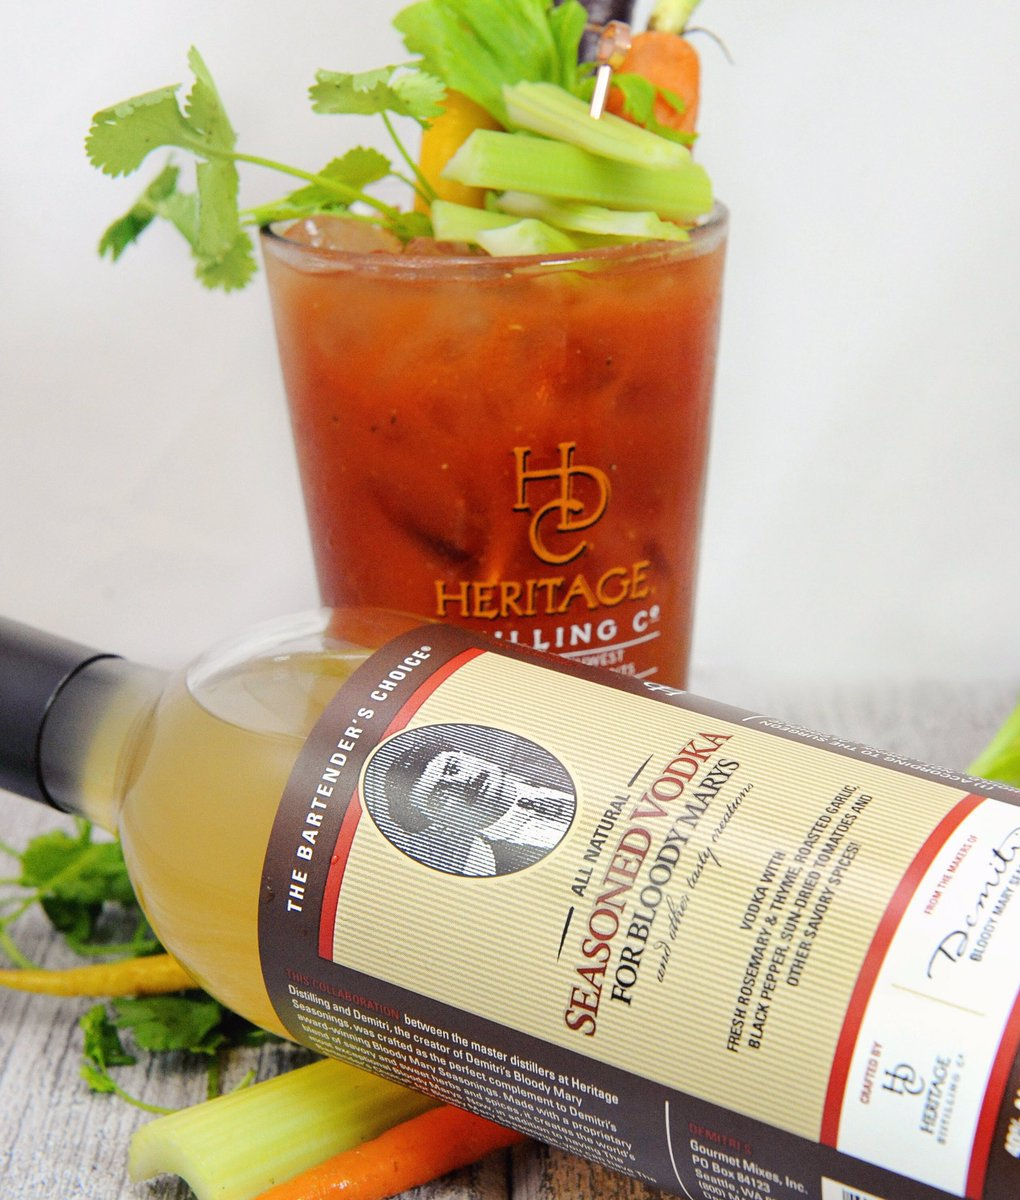 test Twitter Media - Which #HeritageDistilling spirit do you use for your Sunday Bloody Marys? Try our Double Gold Medal winner Seasoned Vodka! https://t.co/GAV2eaAo9q